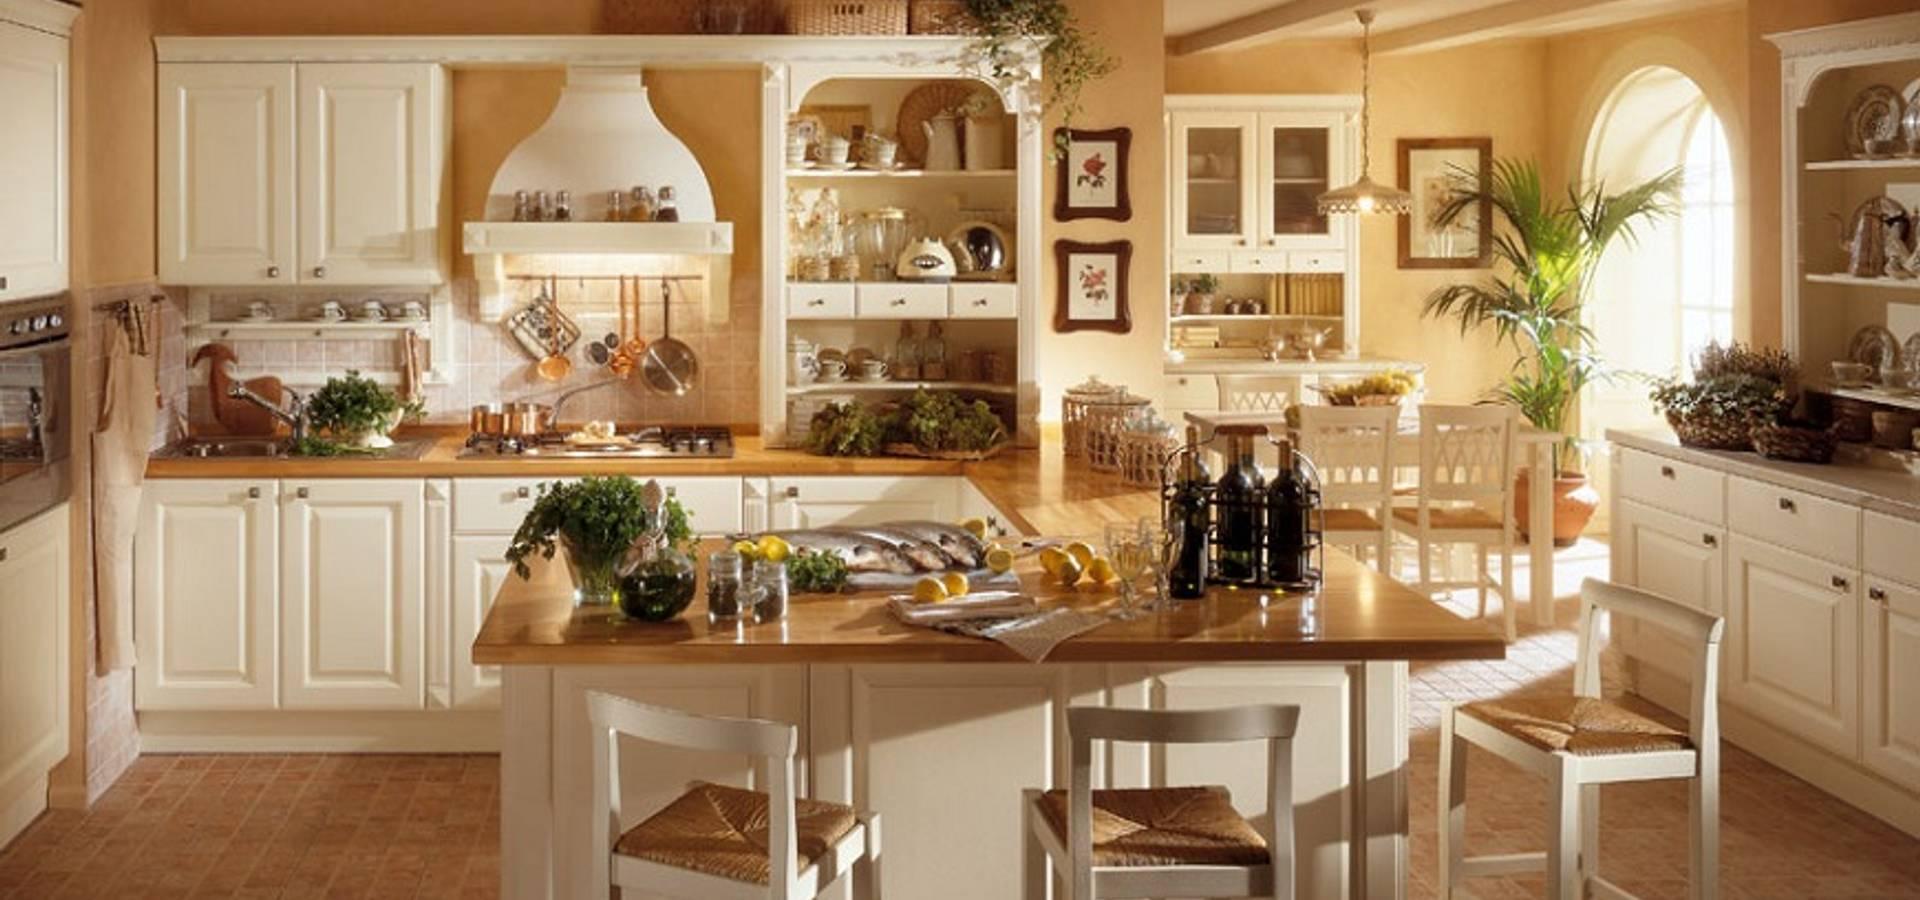 arredamento cucina di arredamenti roma homify